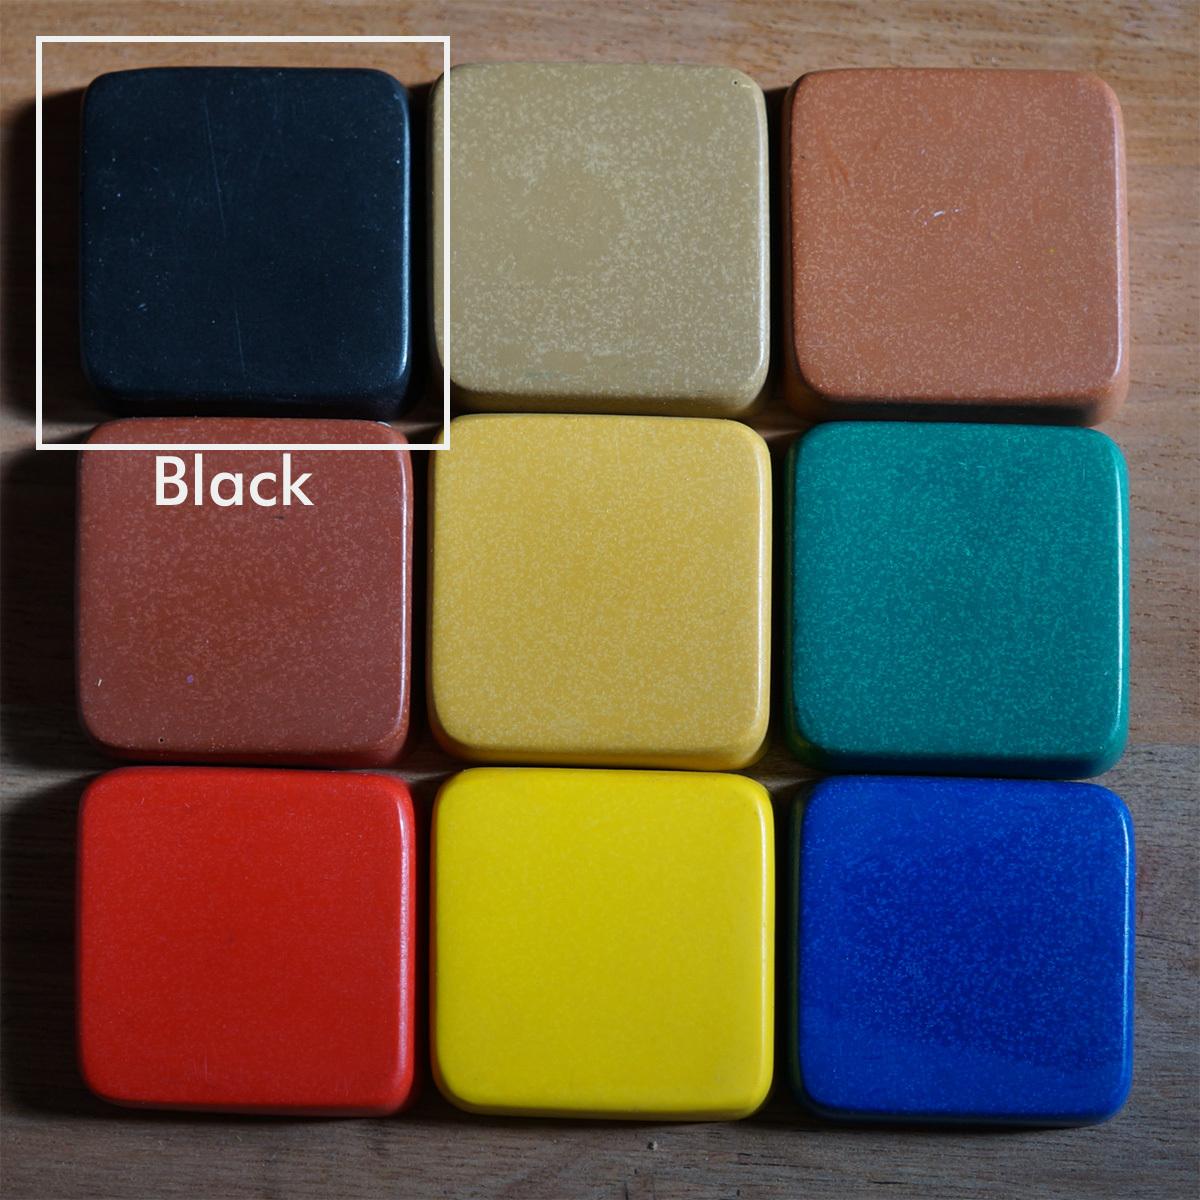 PIGMENT BLACK 100g(着色剤:黒 100g) - 画像2